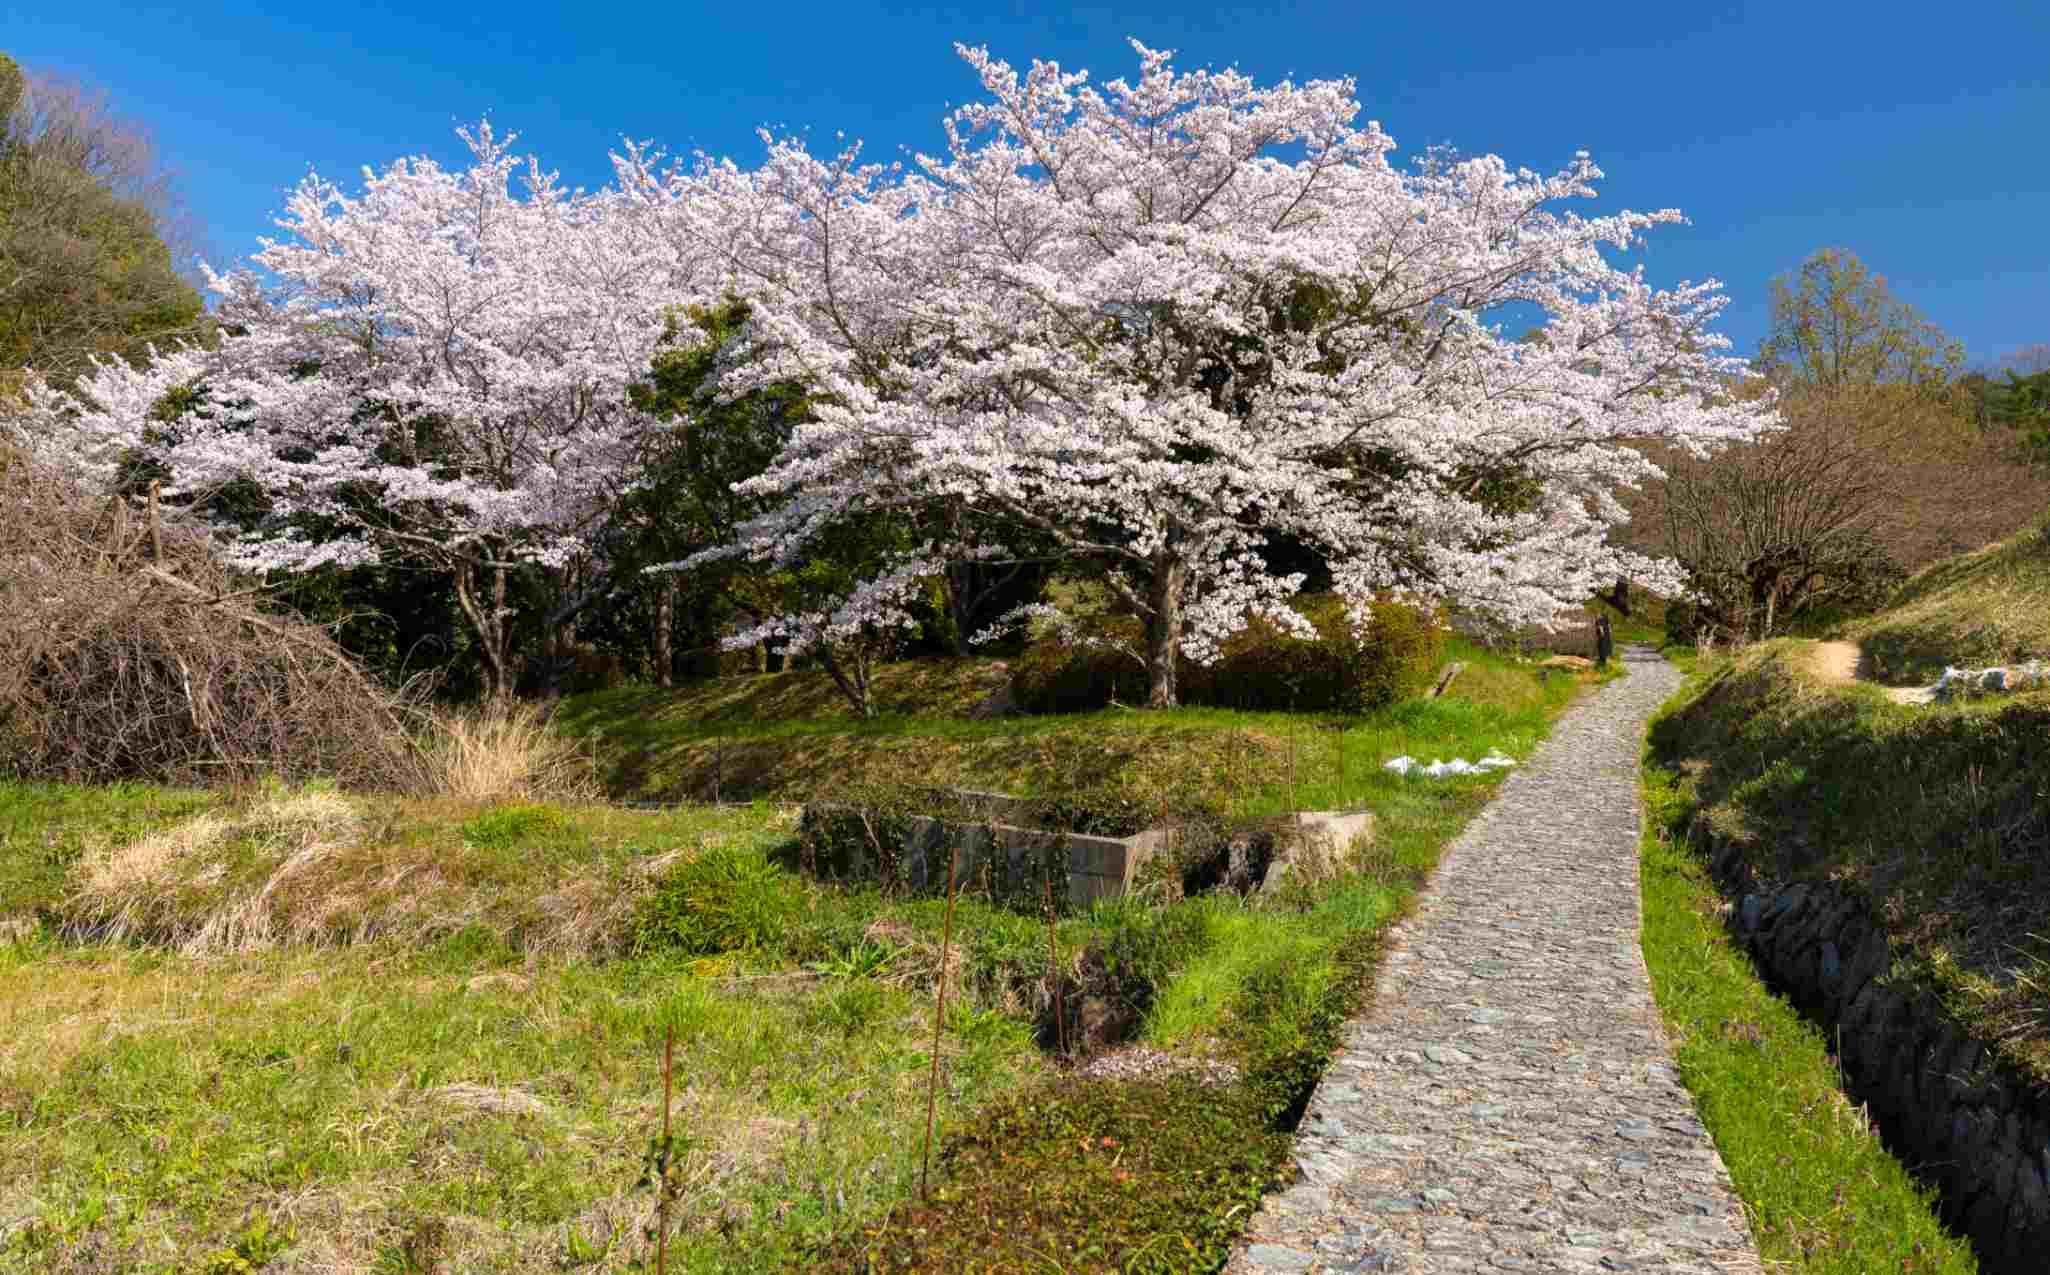 Yamanobe-no-michi Trail